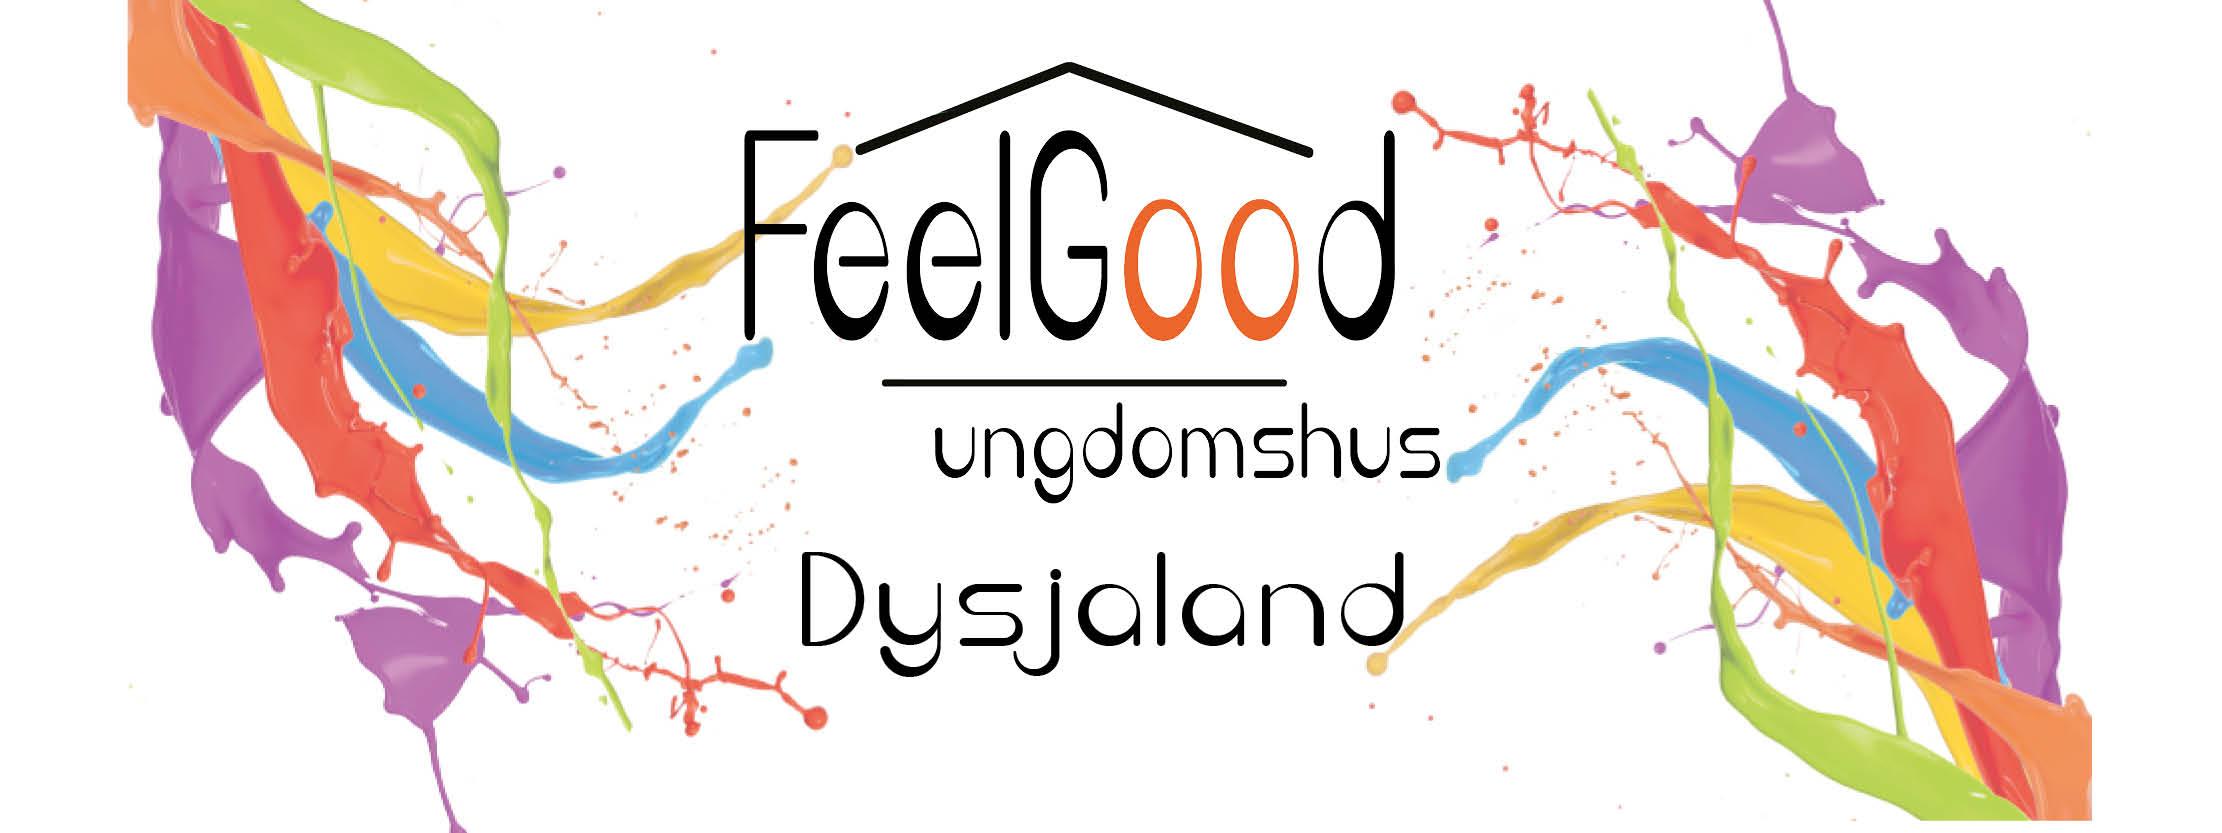 Feelgood Dysjaland Banner.jpg